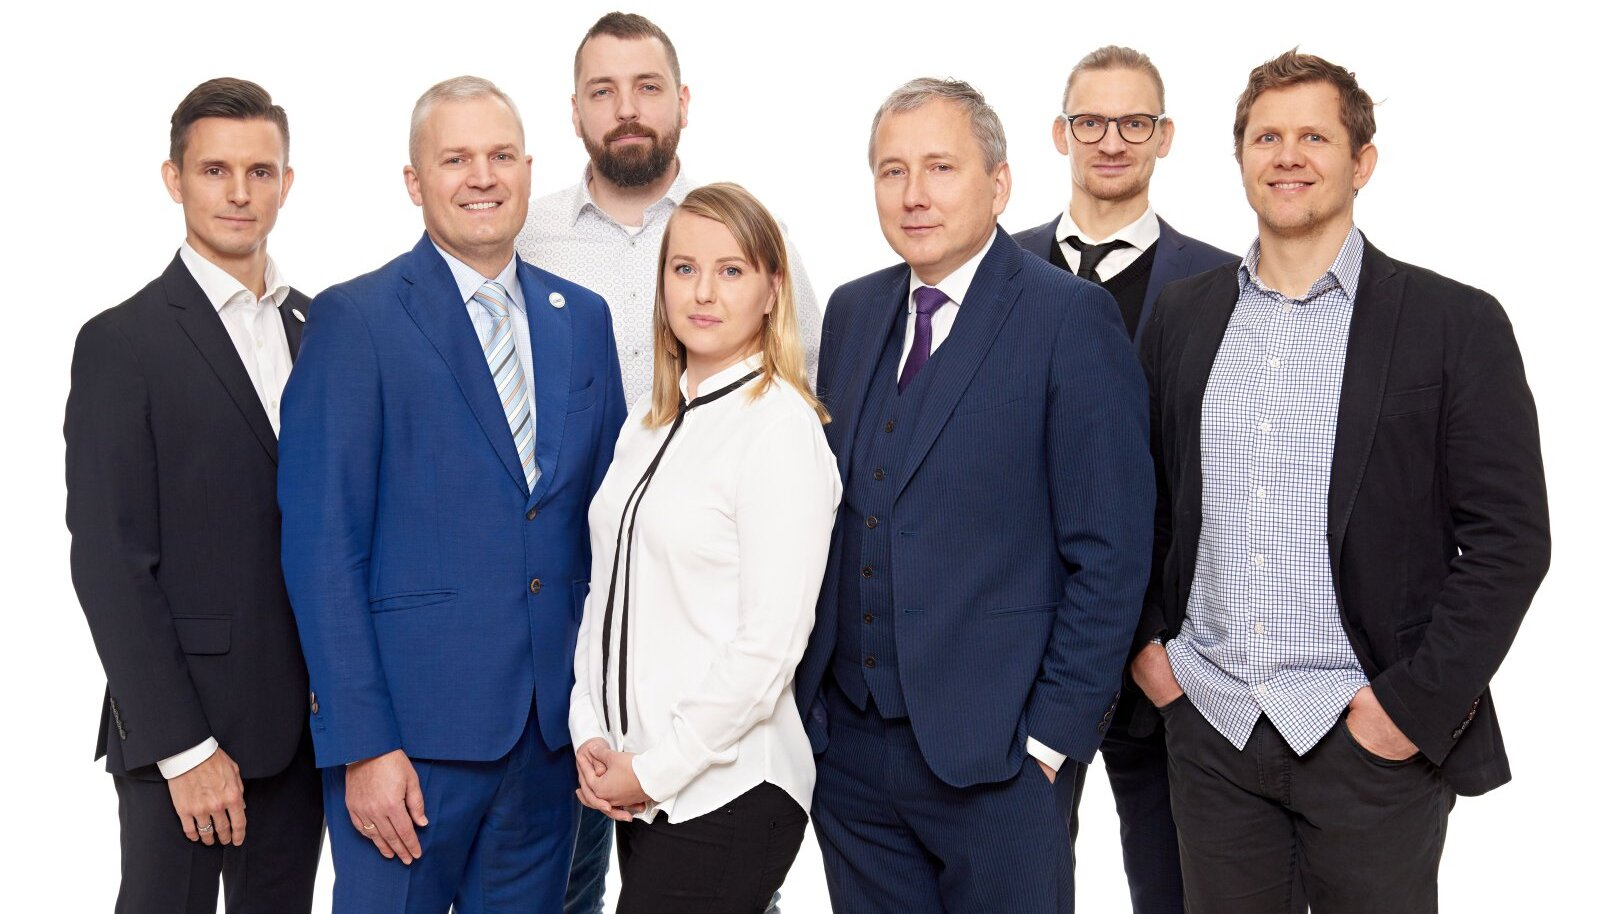 Vasakult paremale: Henri Ormus, Kalev Kallemets, Kaspar Kööp, Merja Pukari, Sandor Liive, Marti Jeltsov, Mait Müntel